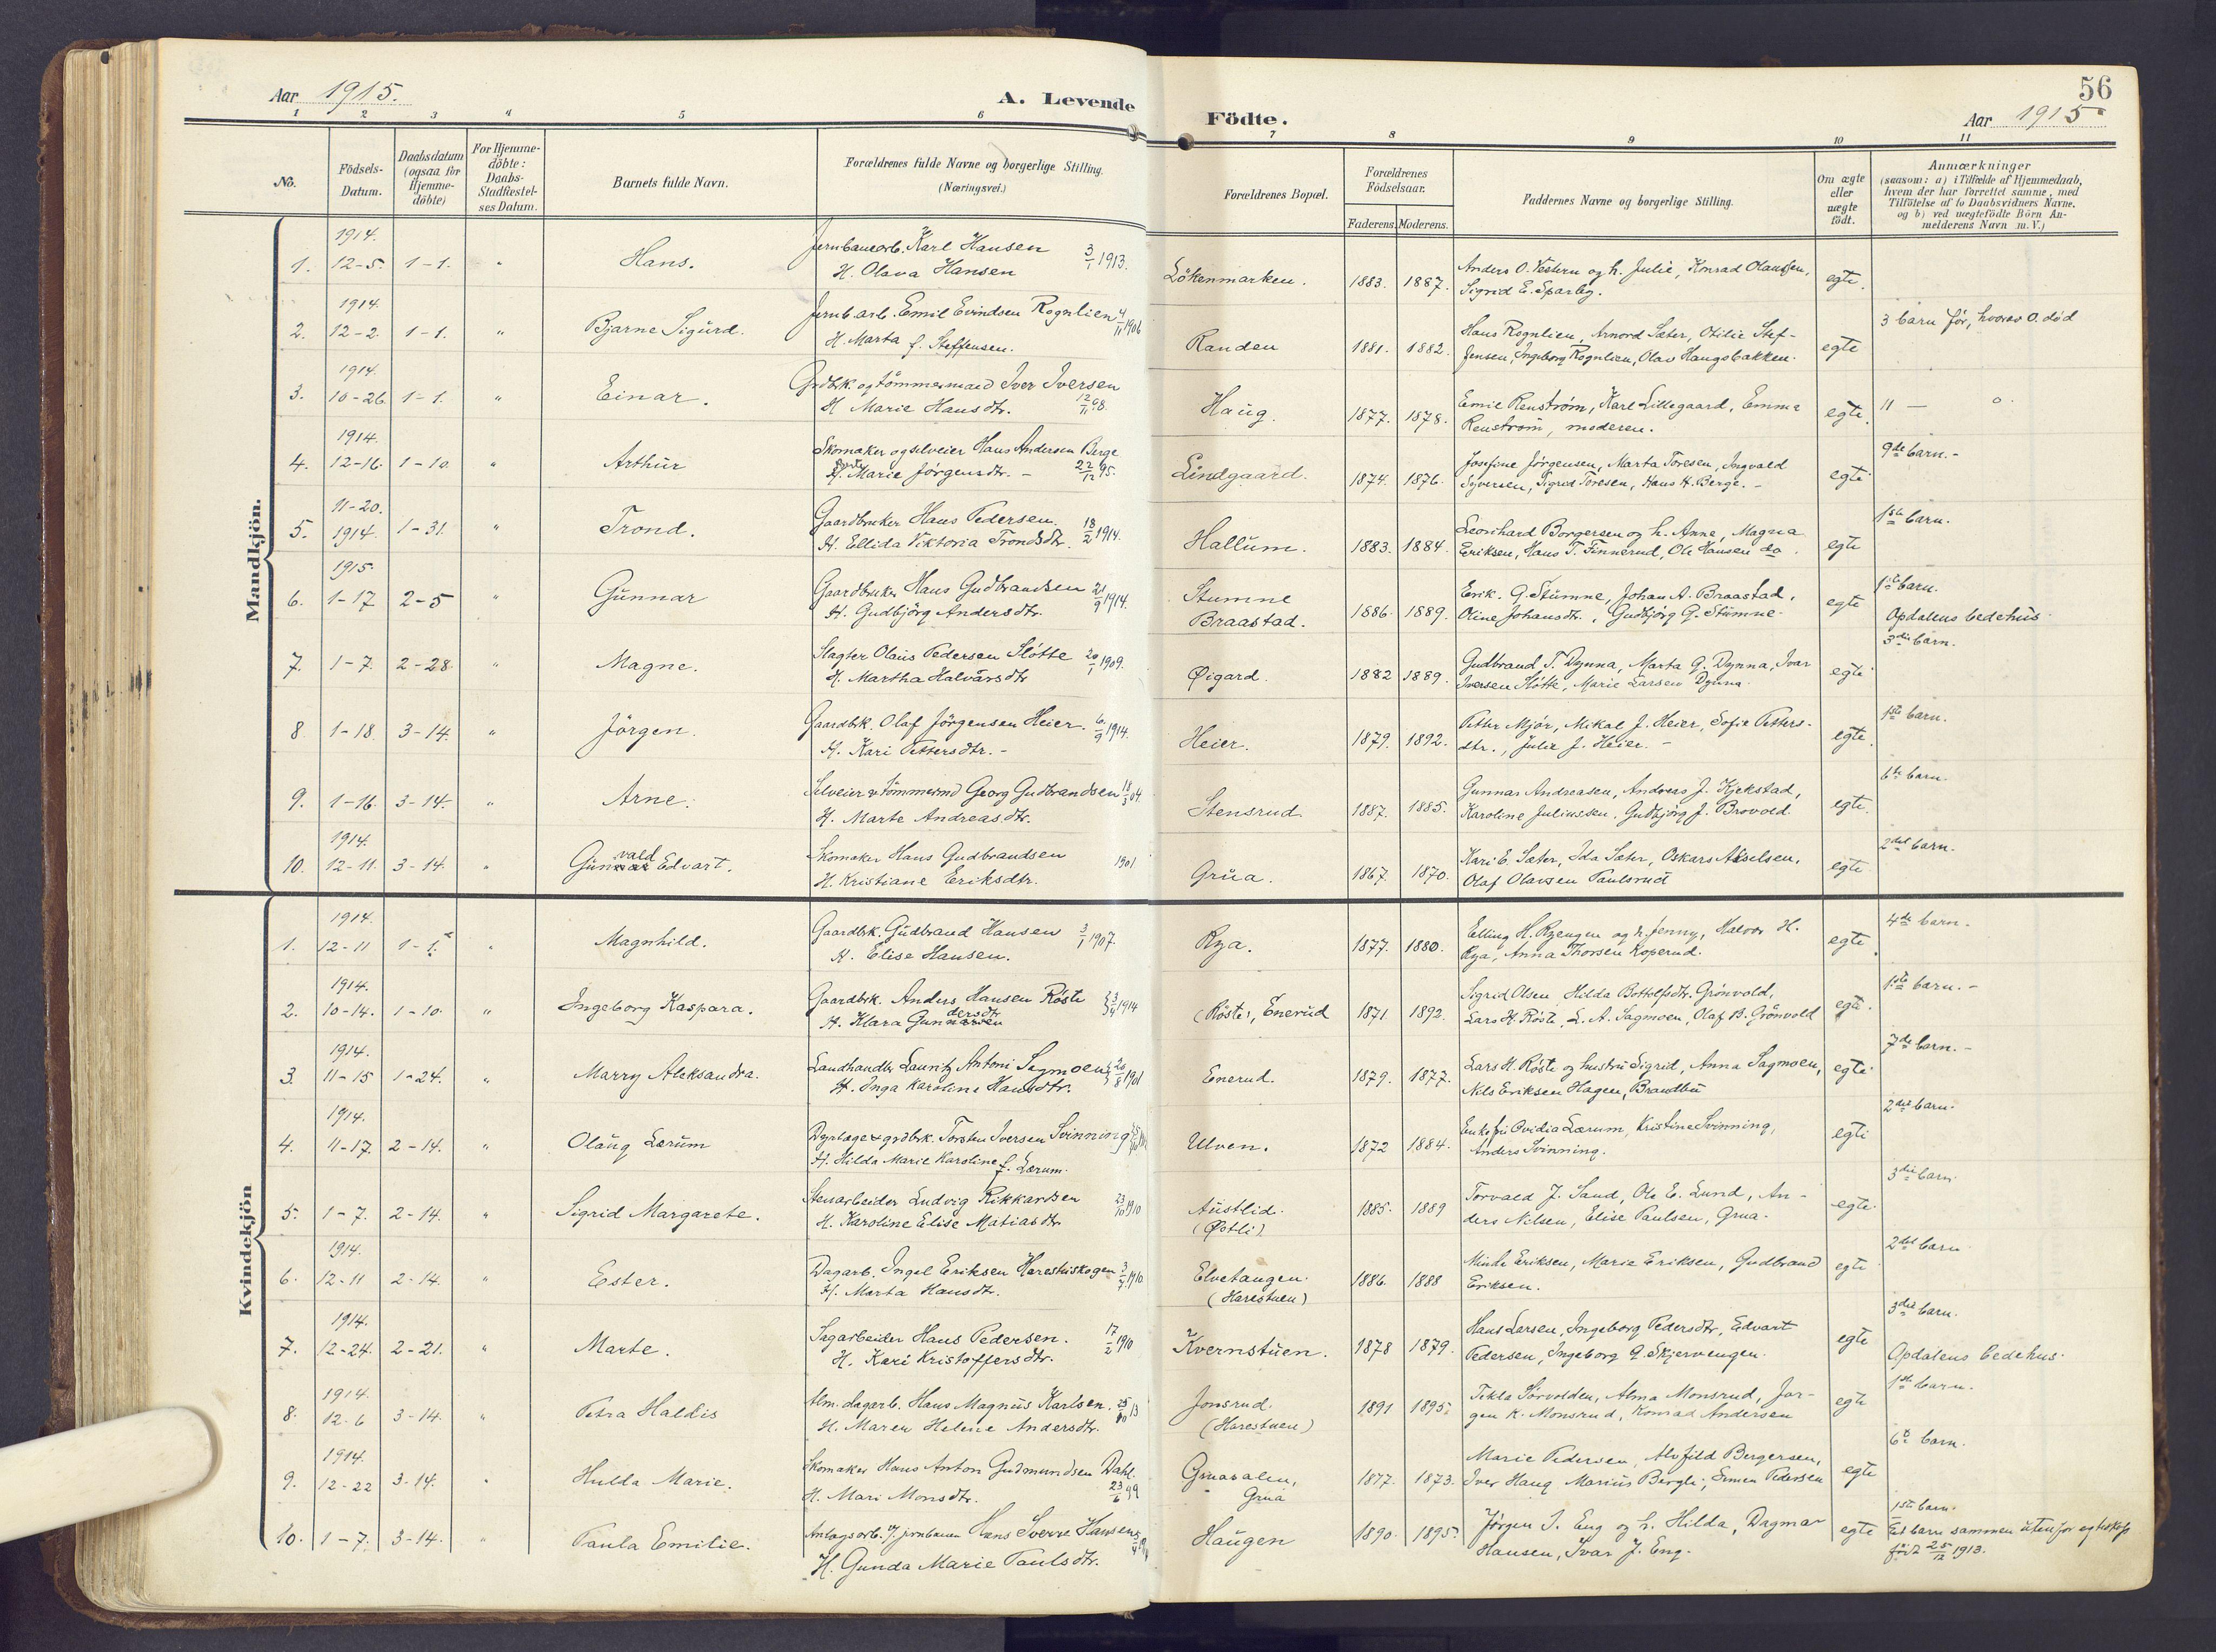 SAH, Lunner prestekontor, H/Ha/Haa/L0001: Ministerialbok nr. 1, 1907-1922, s. 56